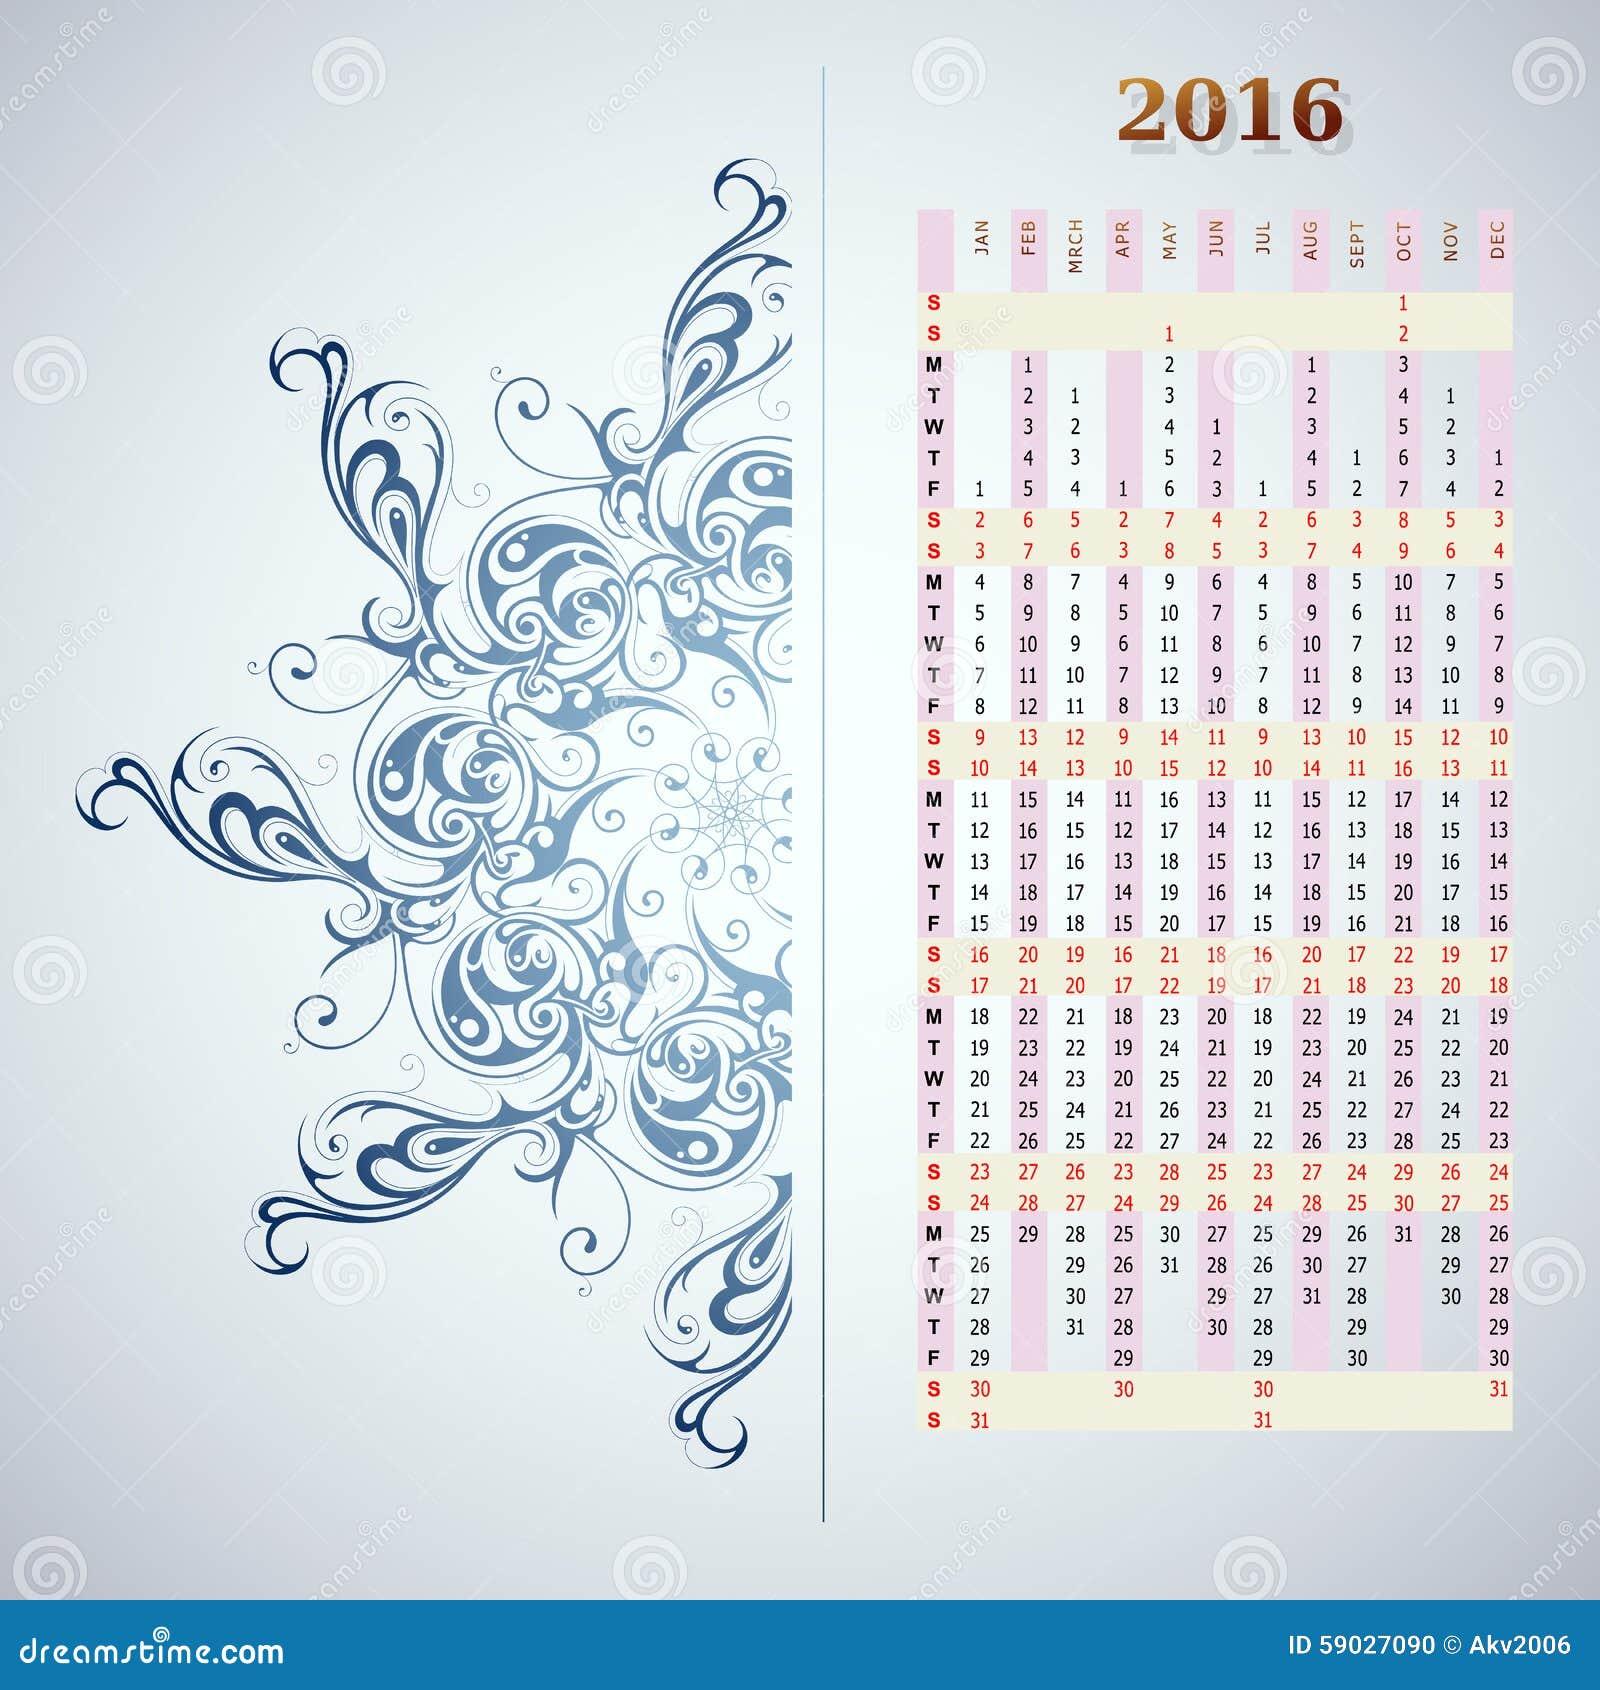 year 2016 vertical calendar stock vector illustration of january